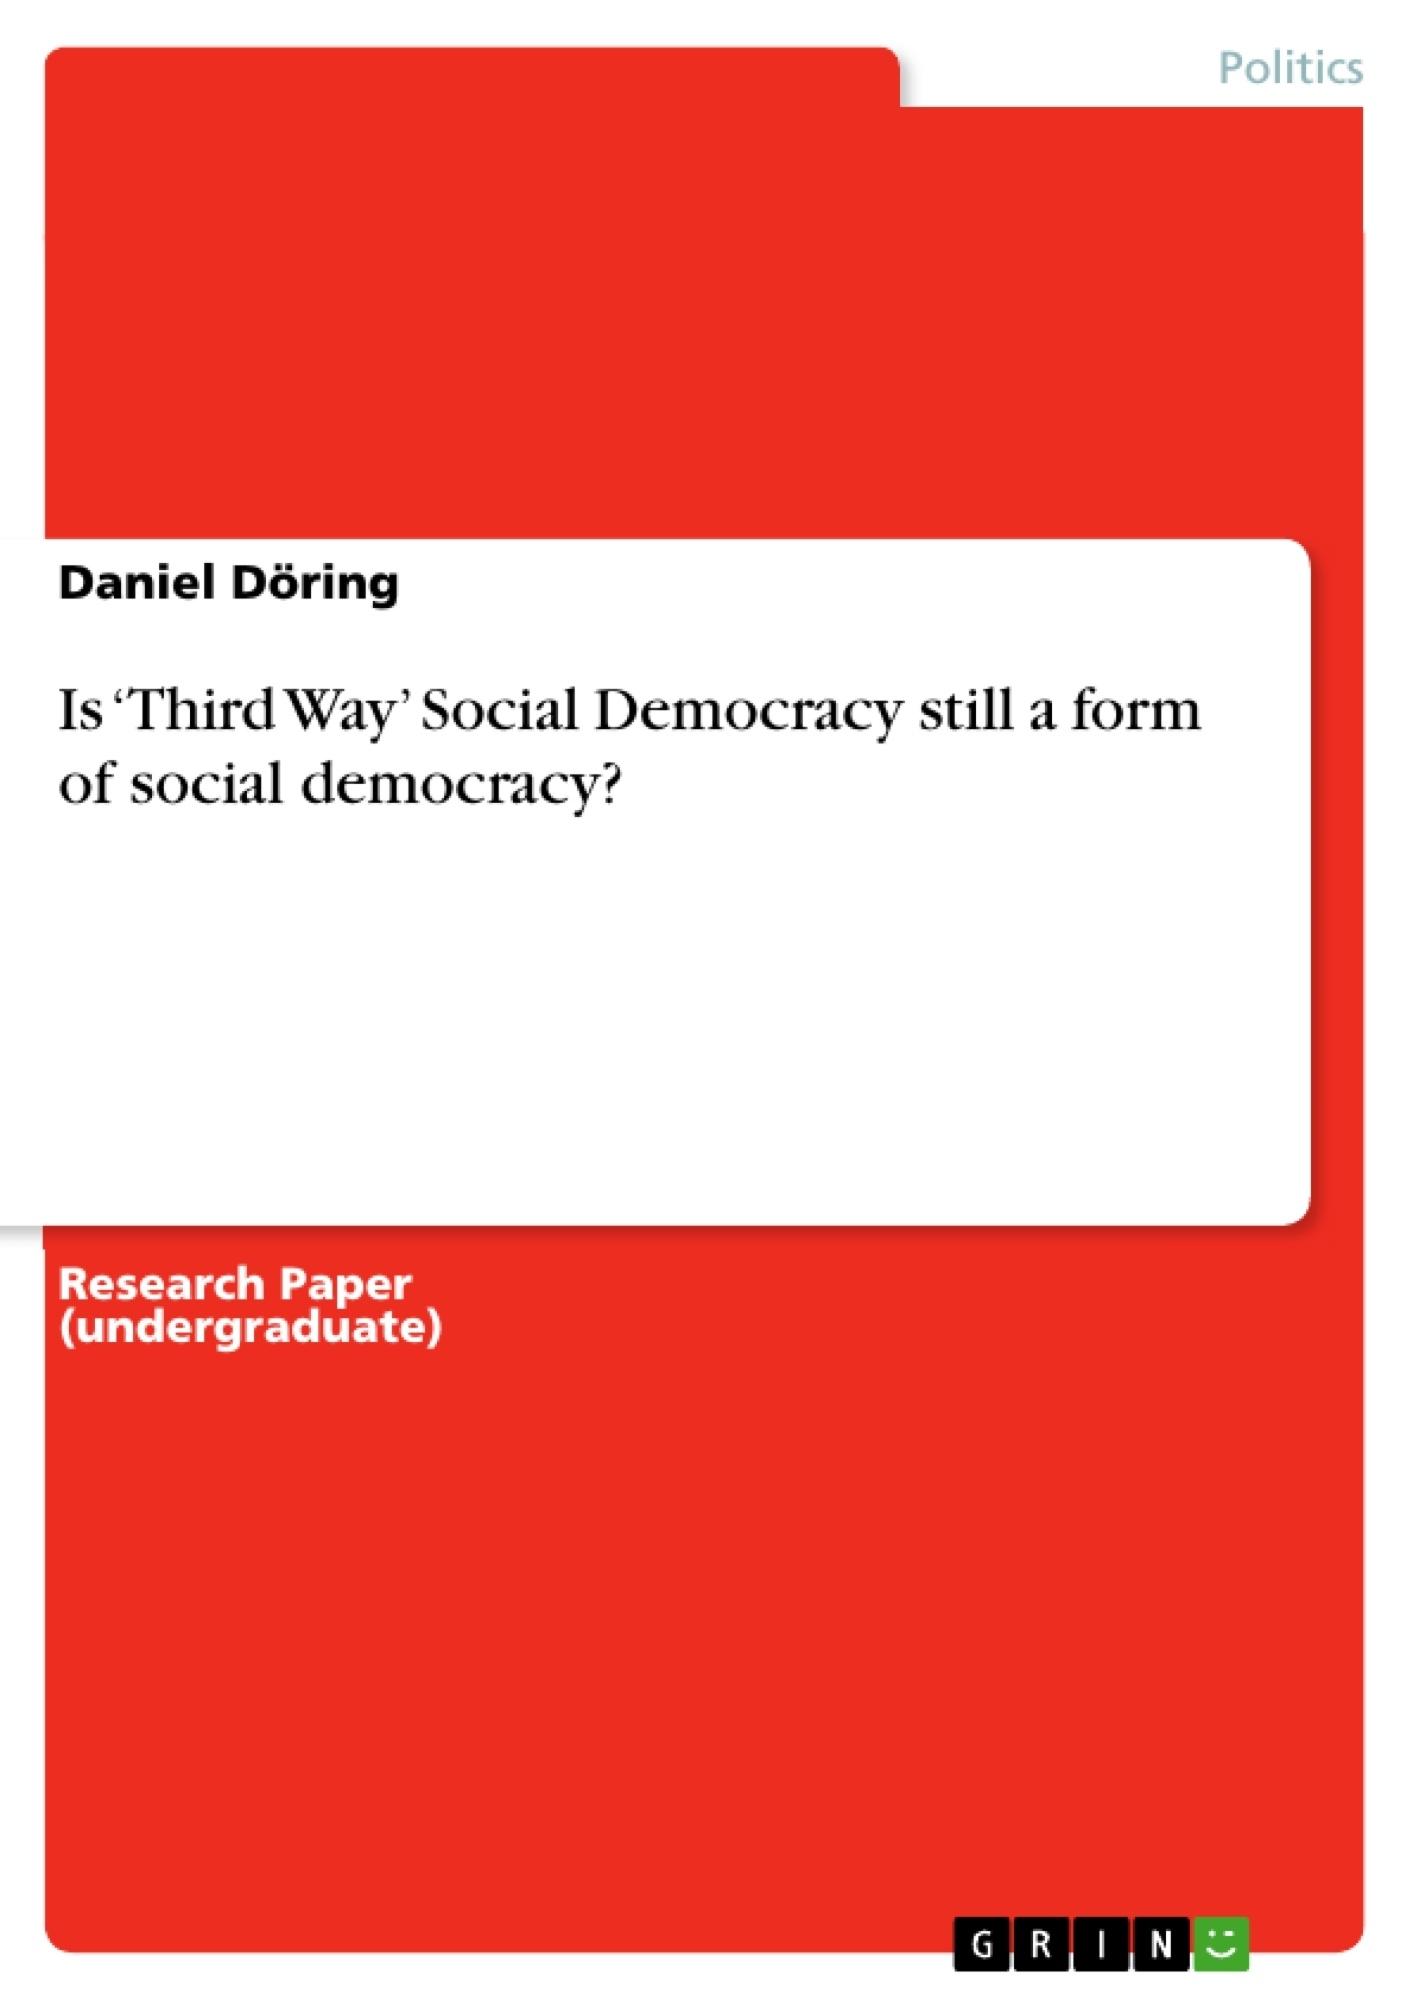 Title: Is 'Third Way' Social Democracy still a form of social democracy?